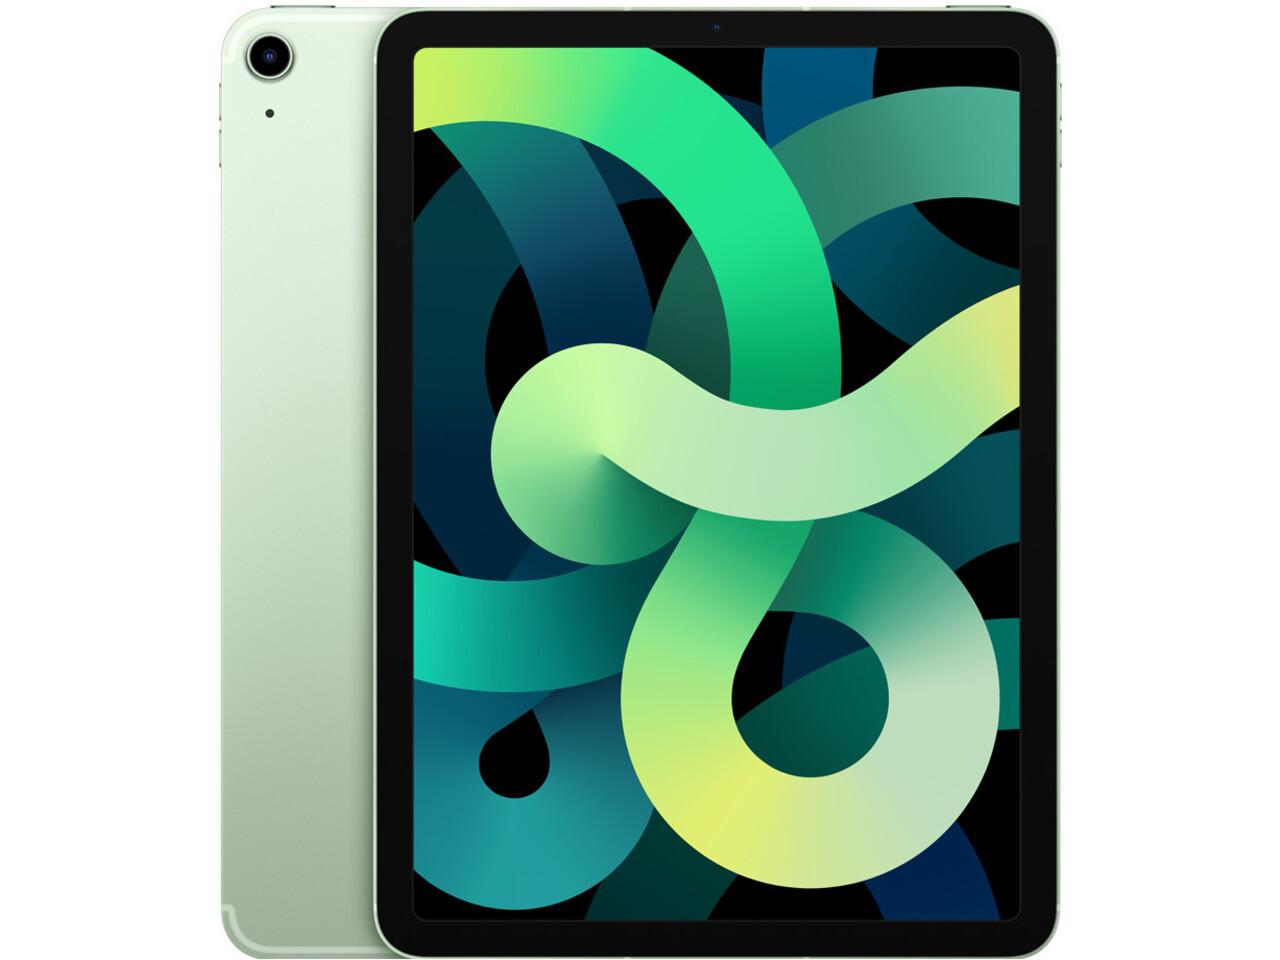 ipad air 4 cellular green